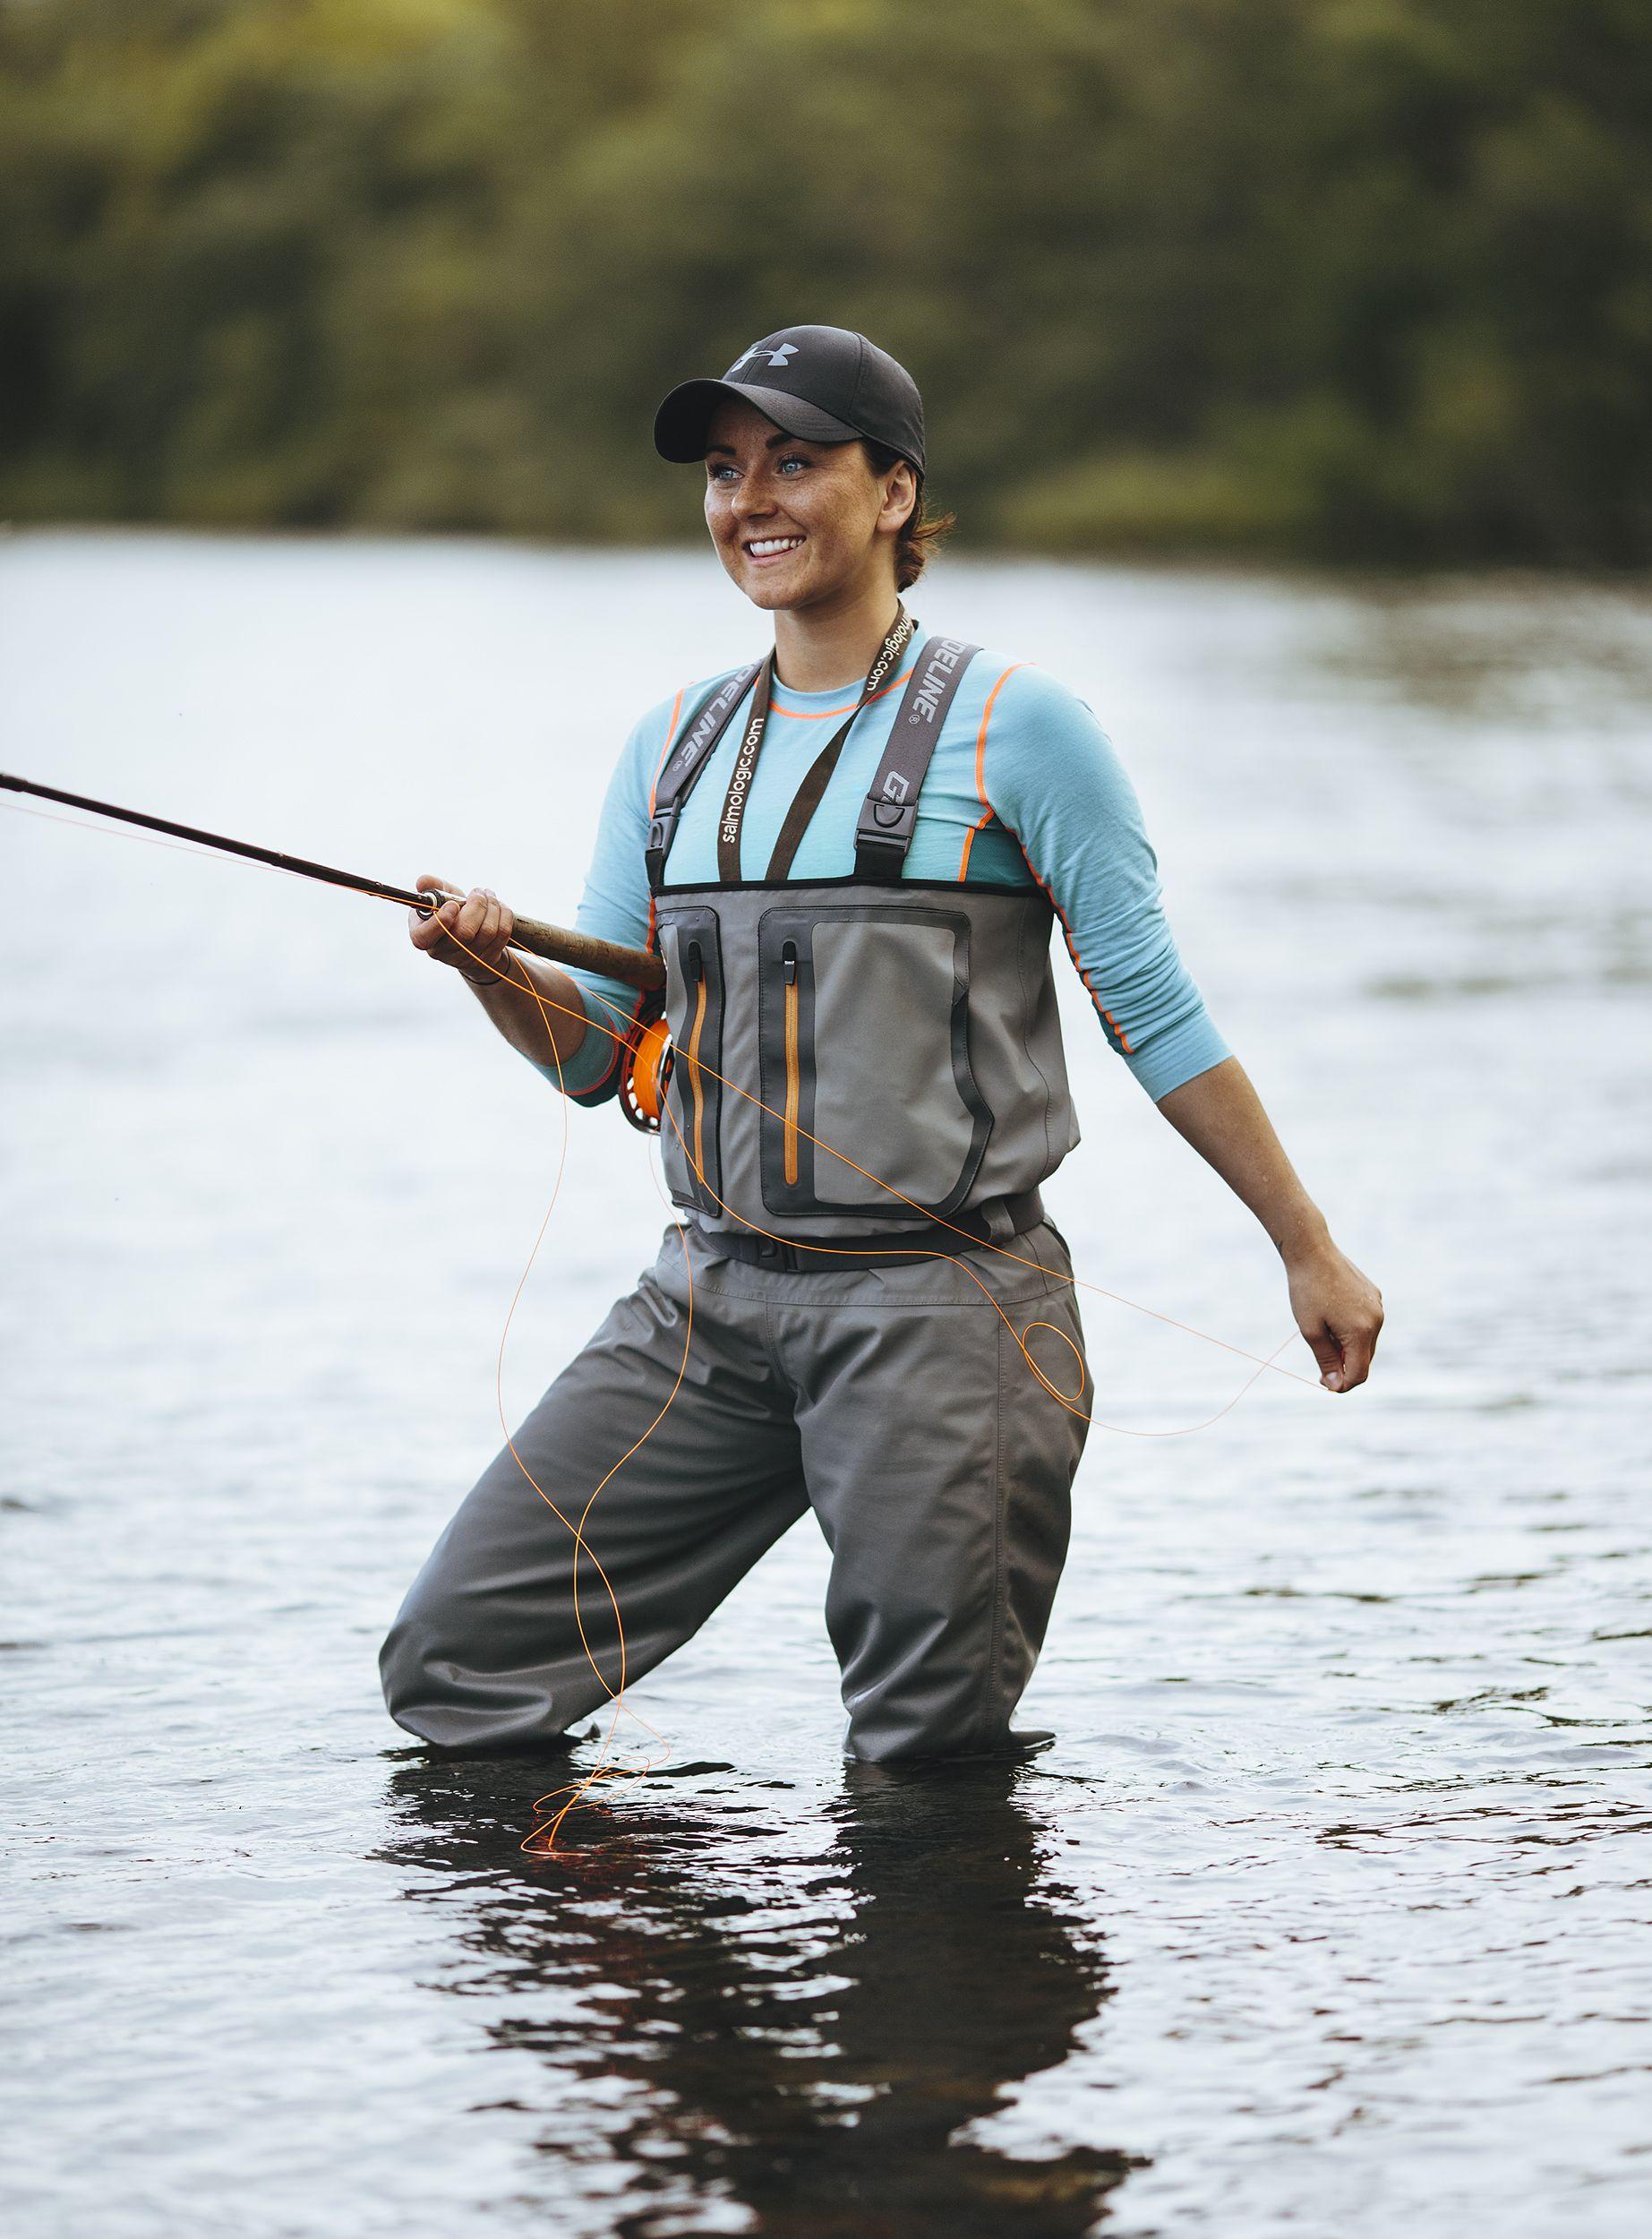 Pin On Fly Fishing Girls